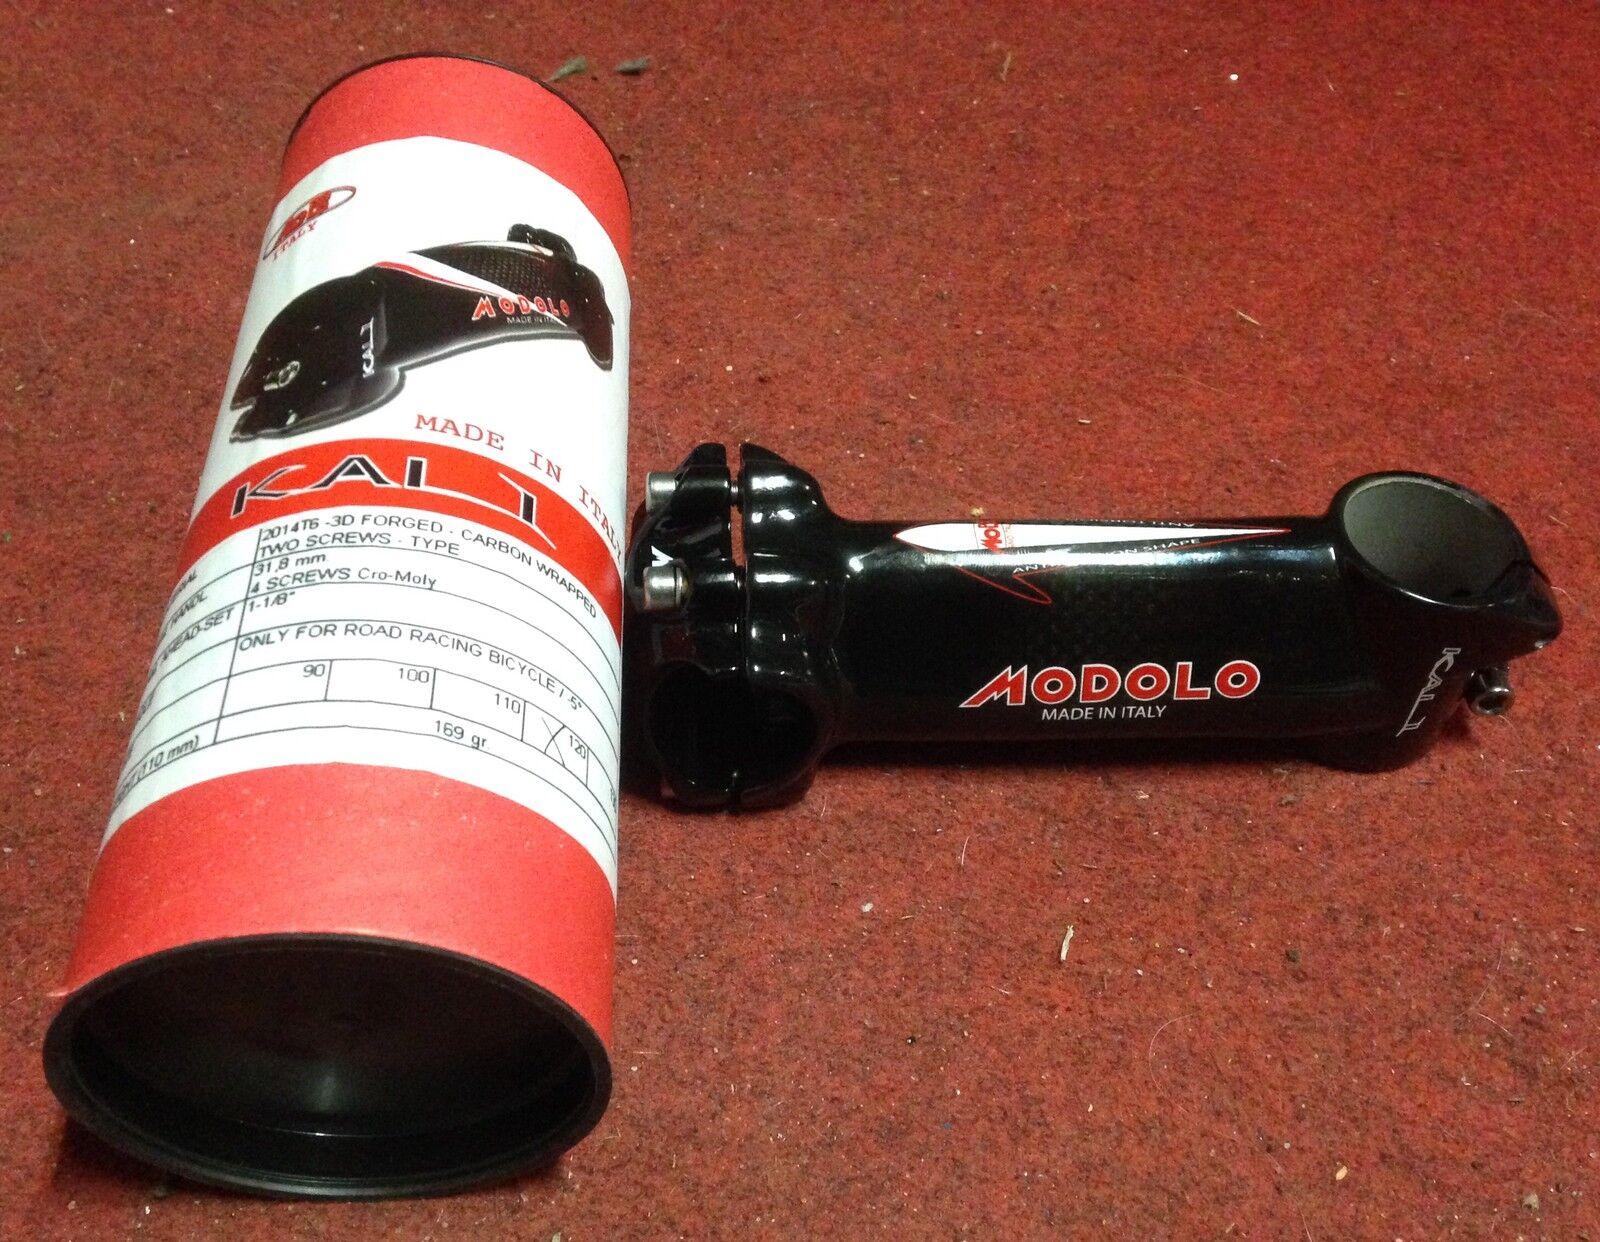 Attacco Manubrio alu-carbonio Modolo Kali 90-130  bike carbon Stem Handlebar  sale online discount